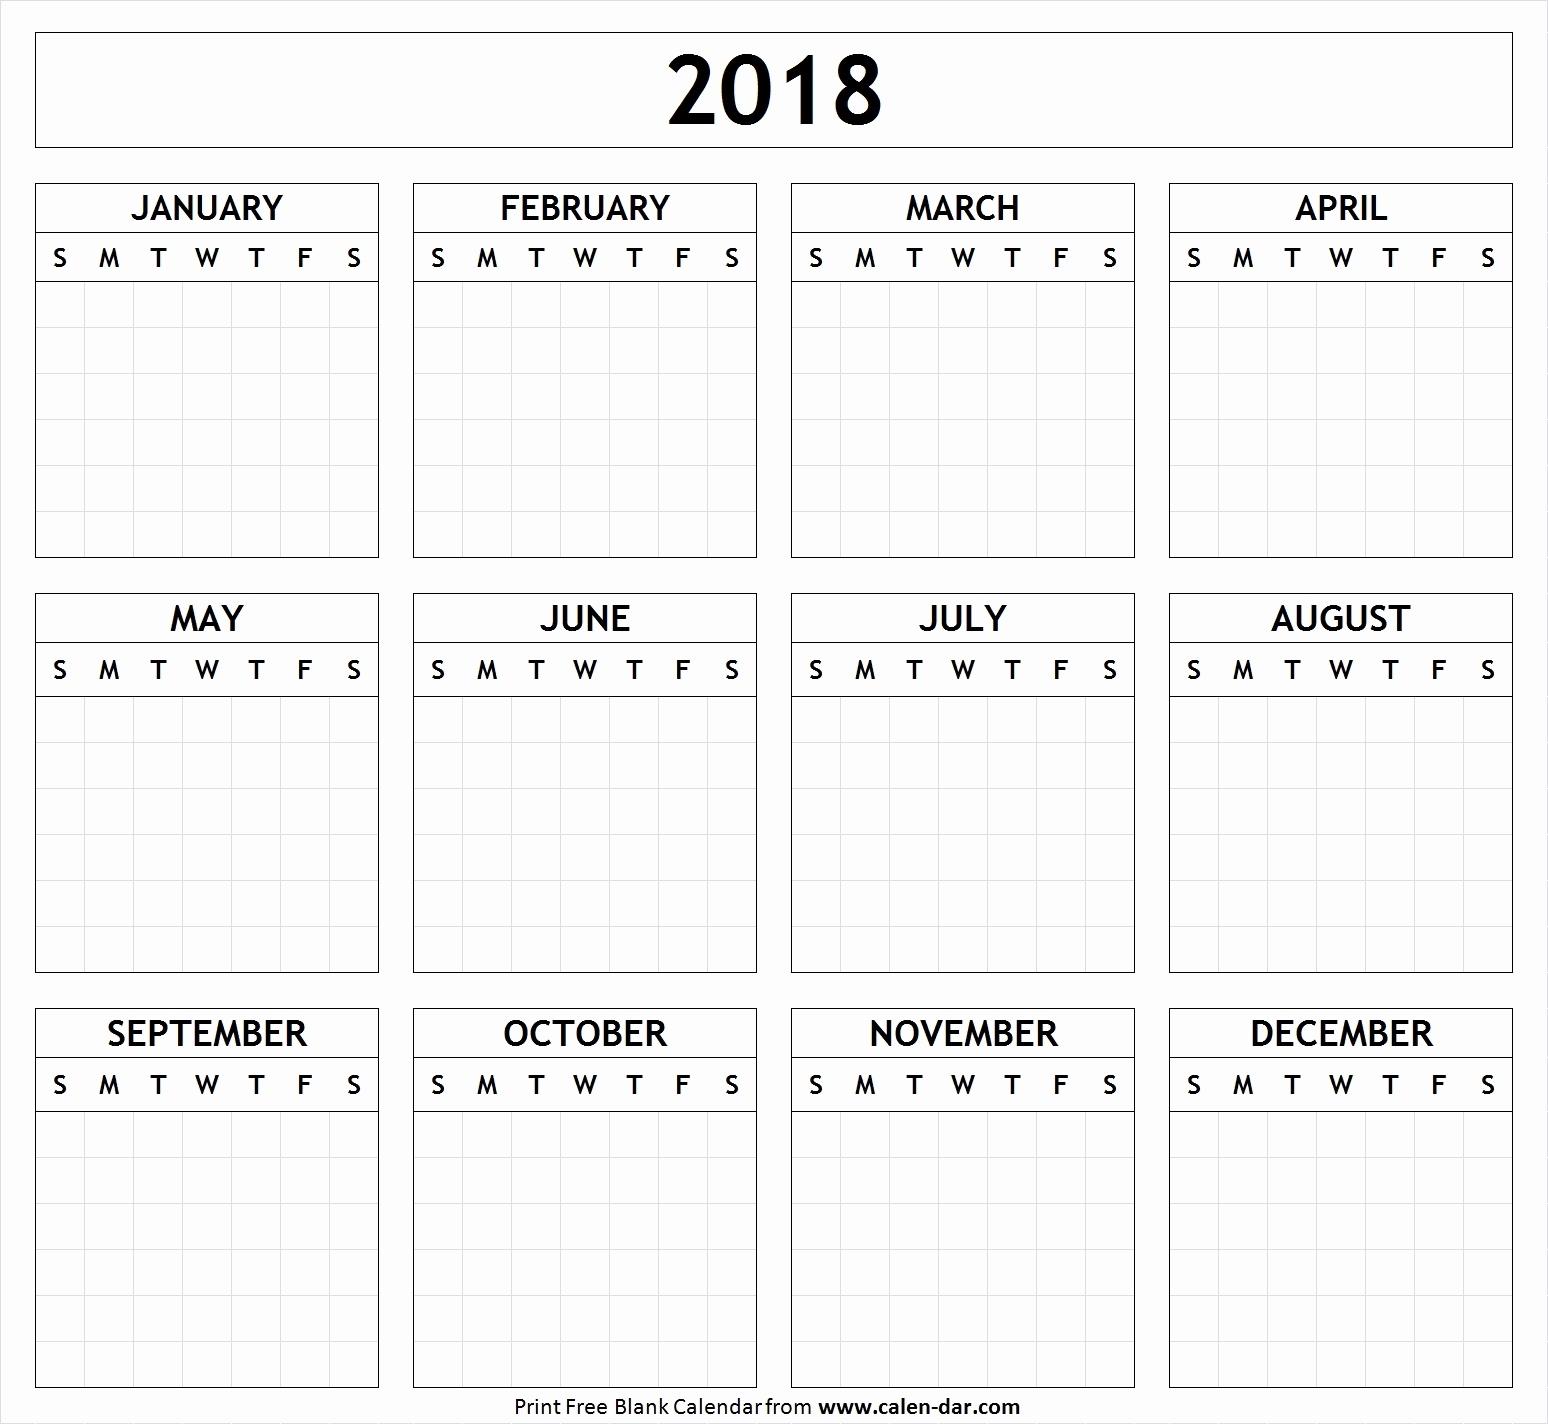 Free Printable 2018 Calendar With Large Boxes Printable Calendar